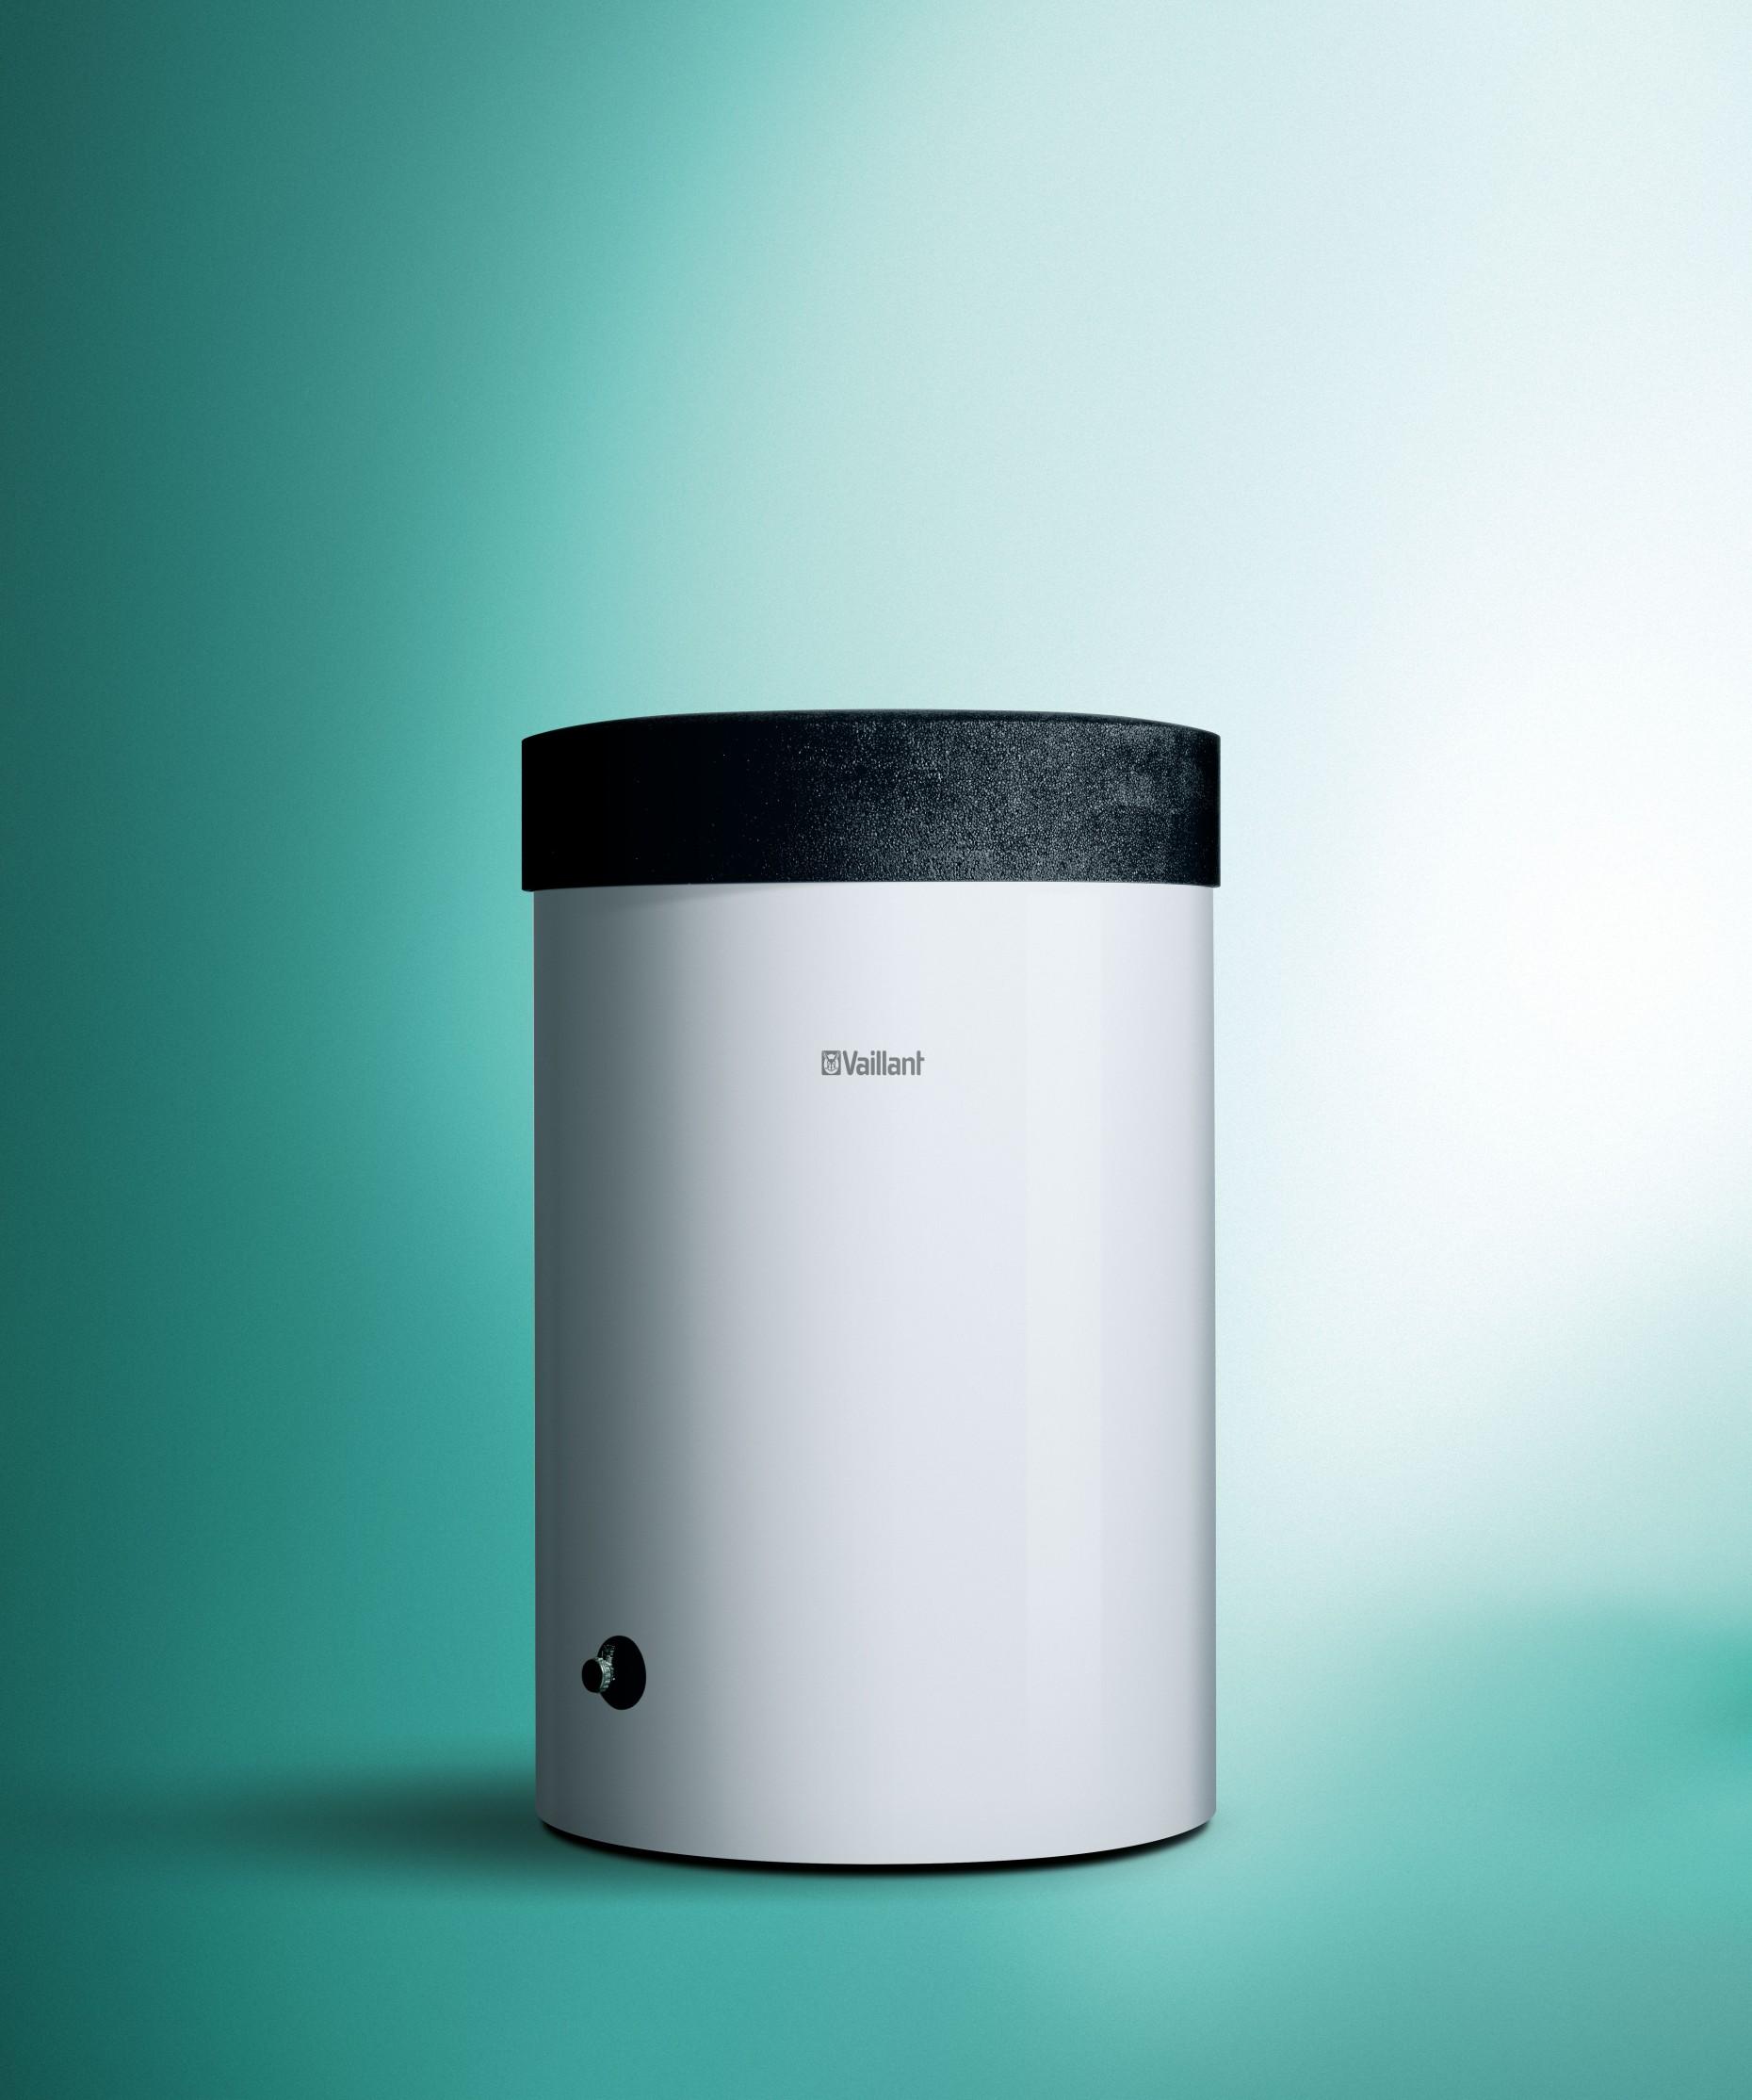 warmwaterboiler unistor vih r 120 200 ha vaillant. Black Bedroom Furniture Sets. Home Design Ideas